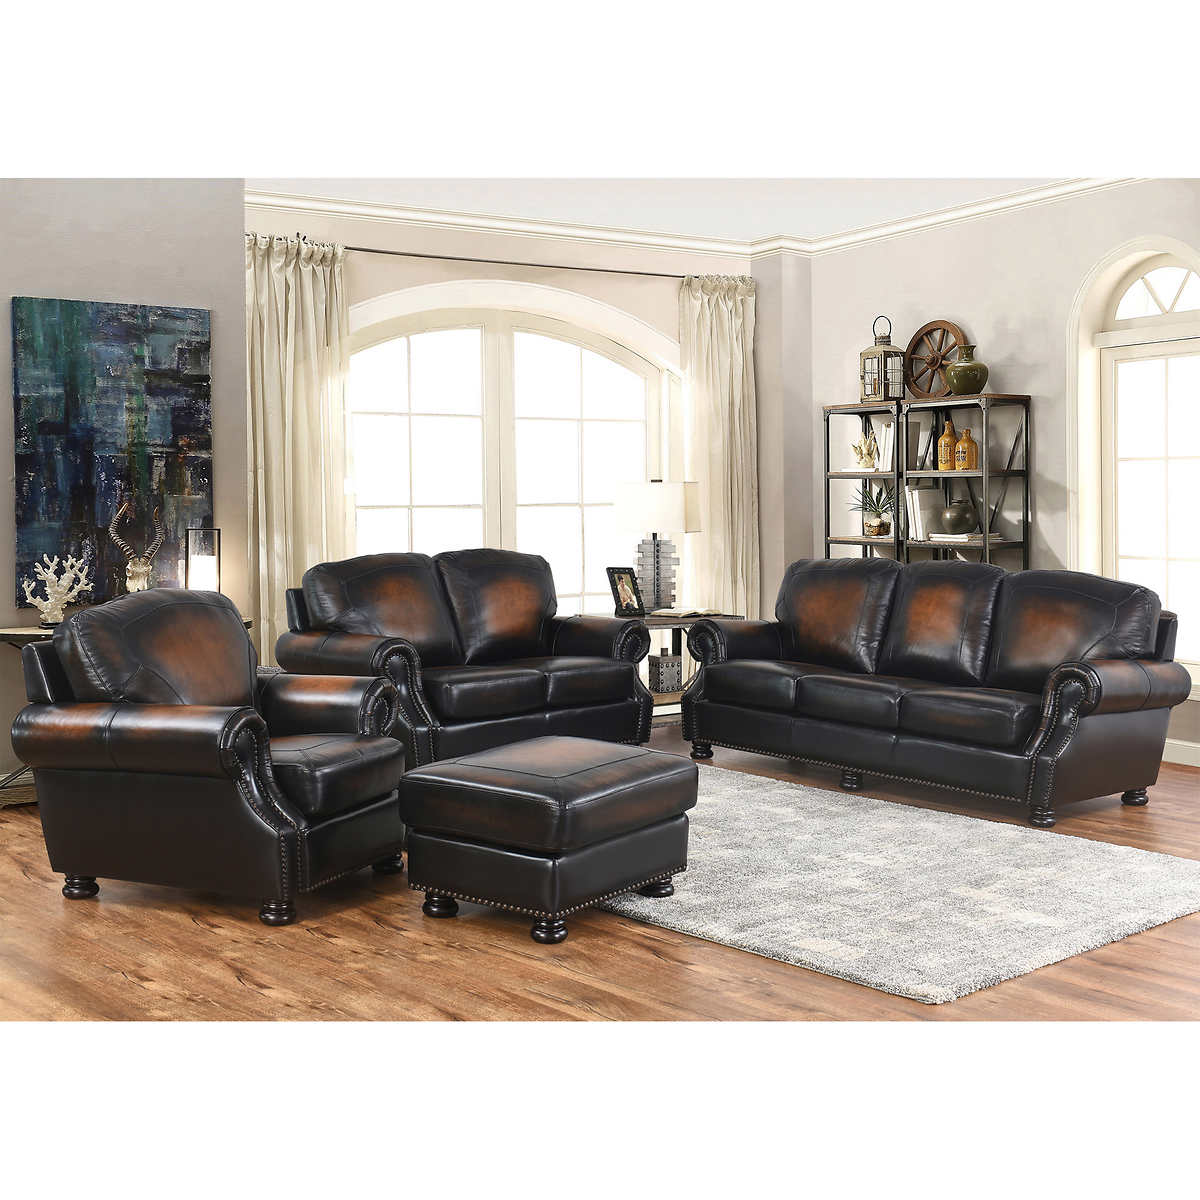 Ellis 4-piece Top Grain Leather Living Room Set